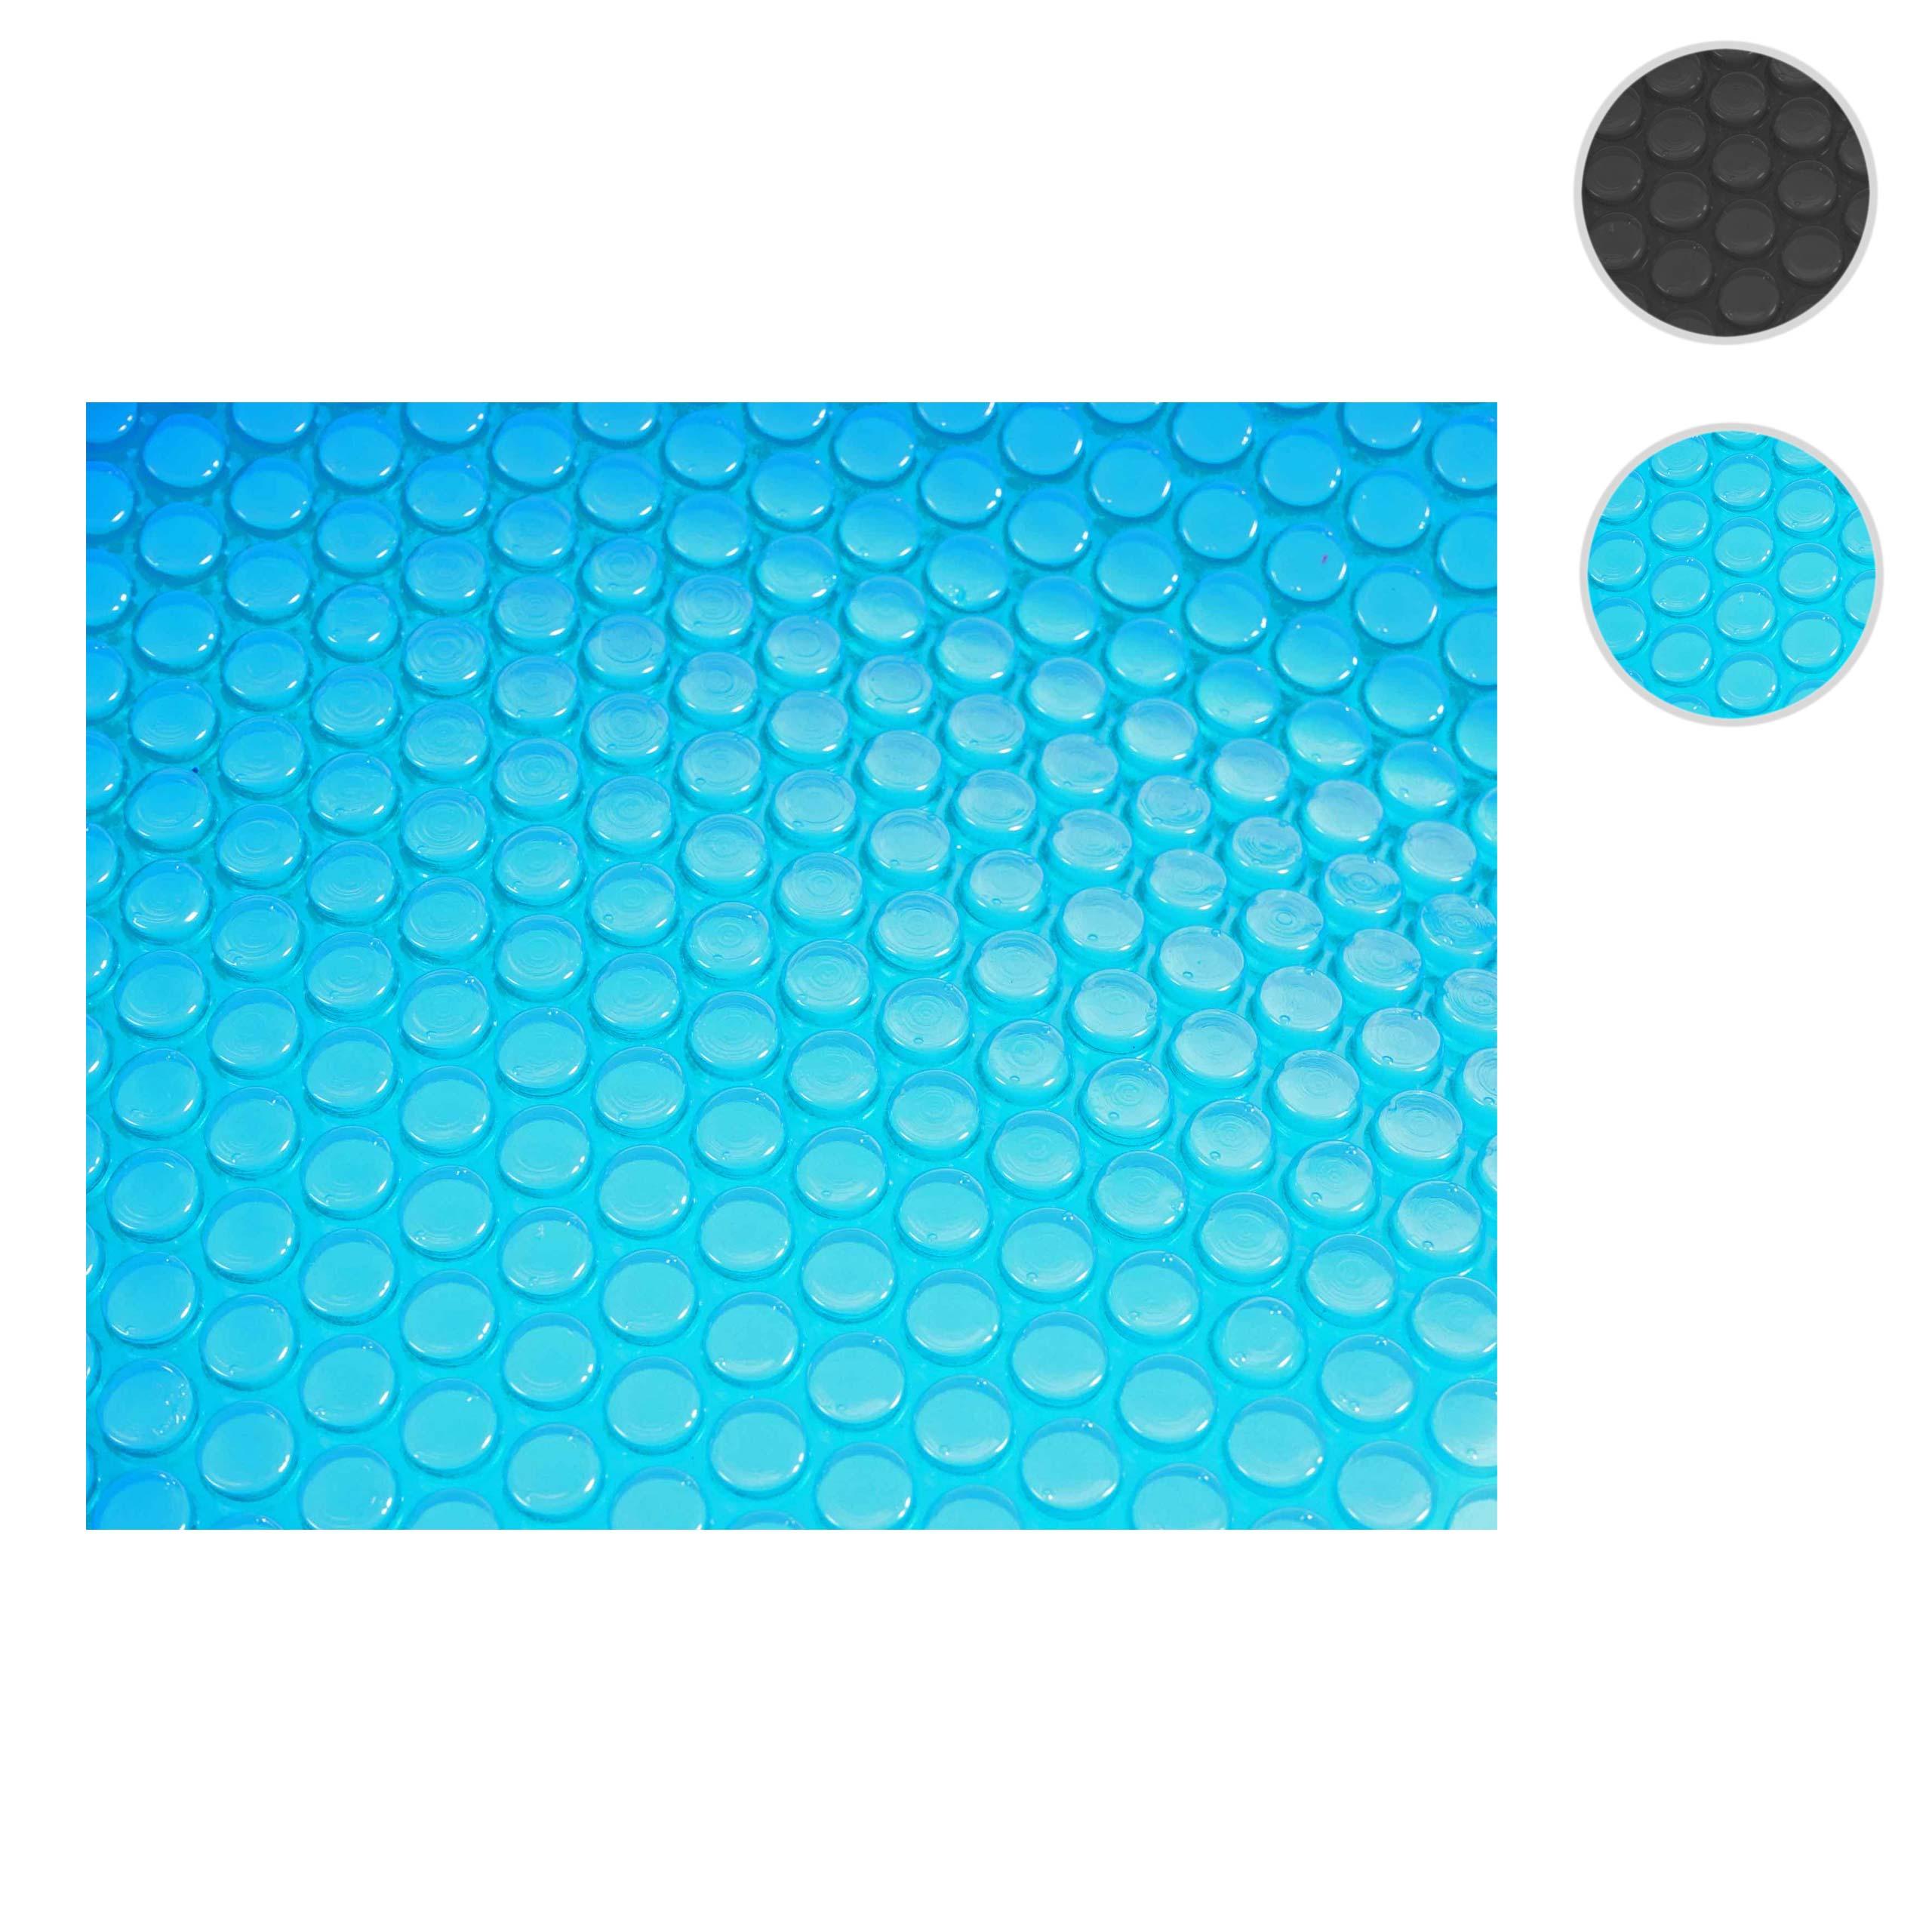 Mendler Pool-Abdeckung Wärmeplane Abdeckplane Solarplane Solarabdeckung, Stärke: 200 µm ~ Variantenangebot 16701